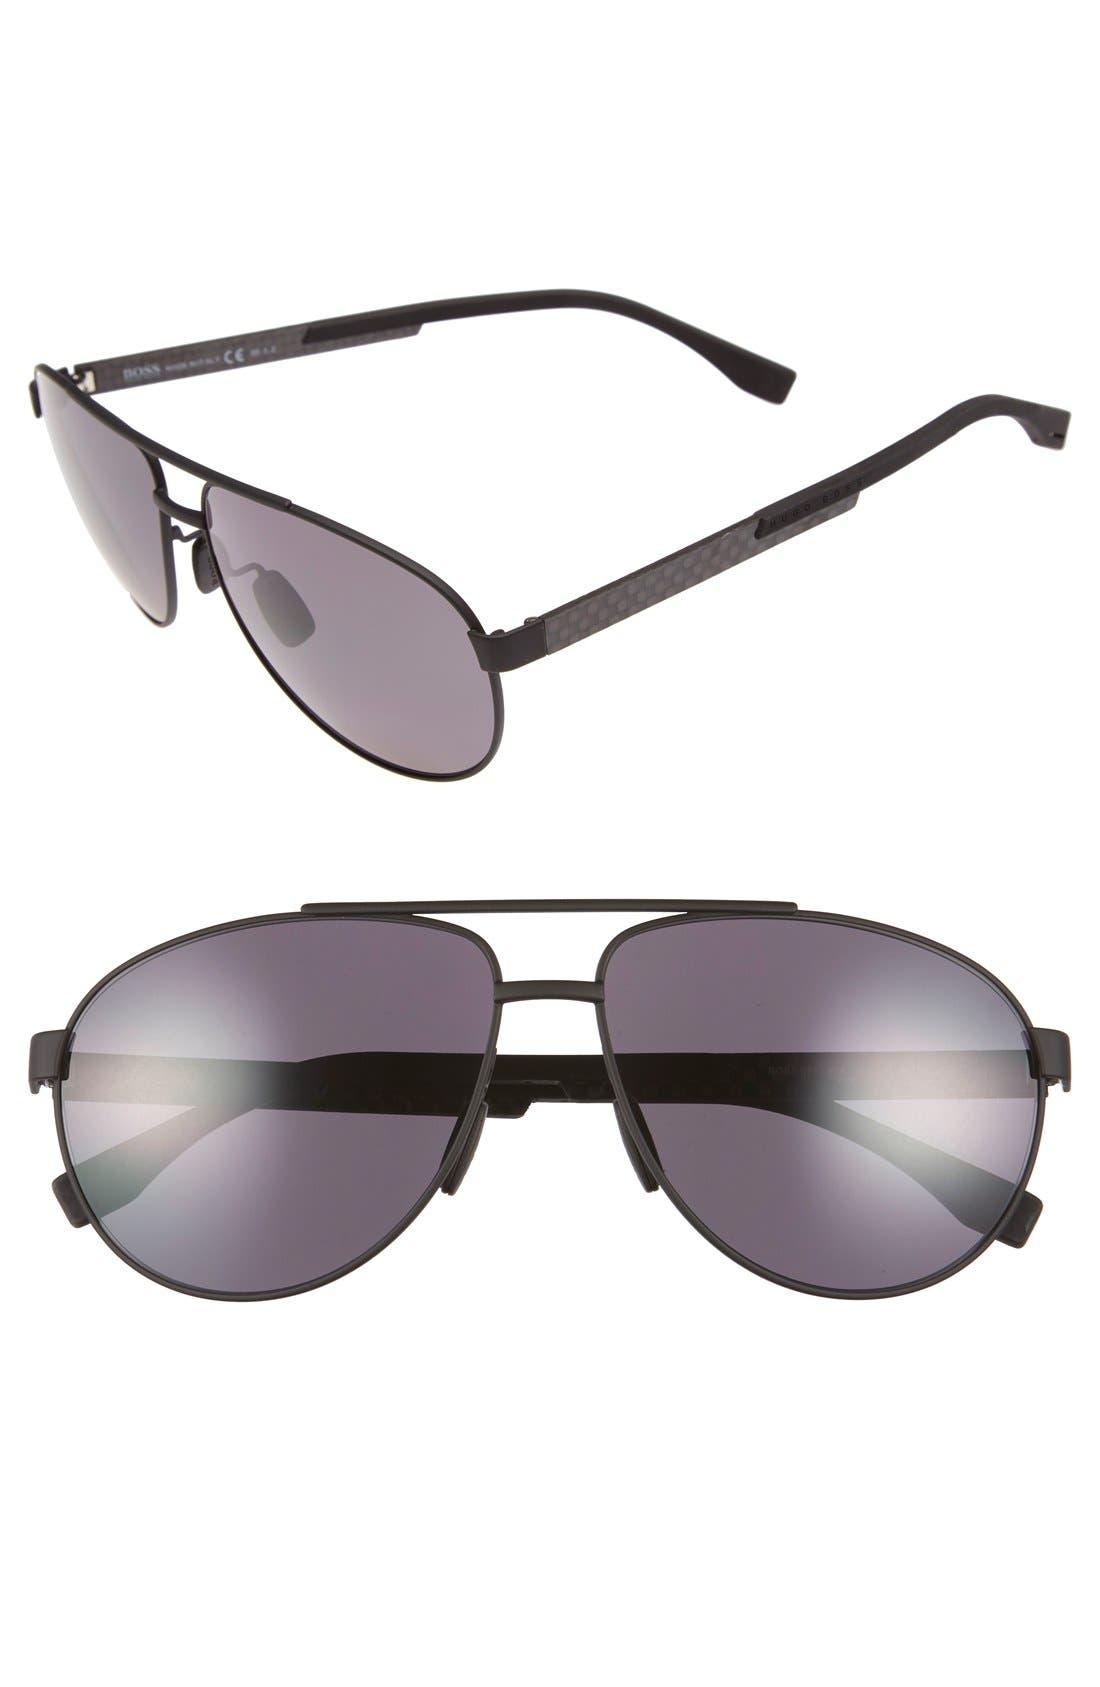 63mm Polarized Sunglasses,                         Main,                         color, 001